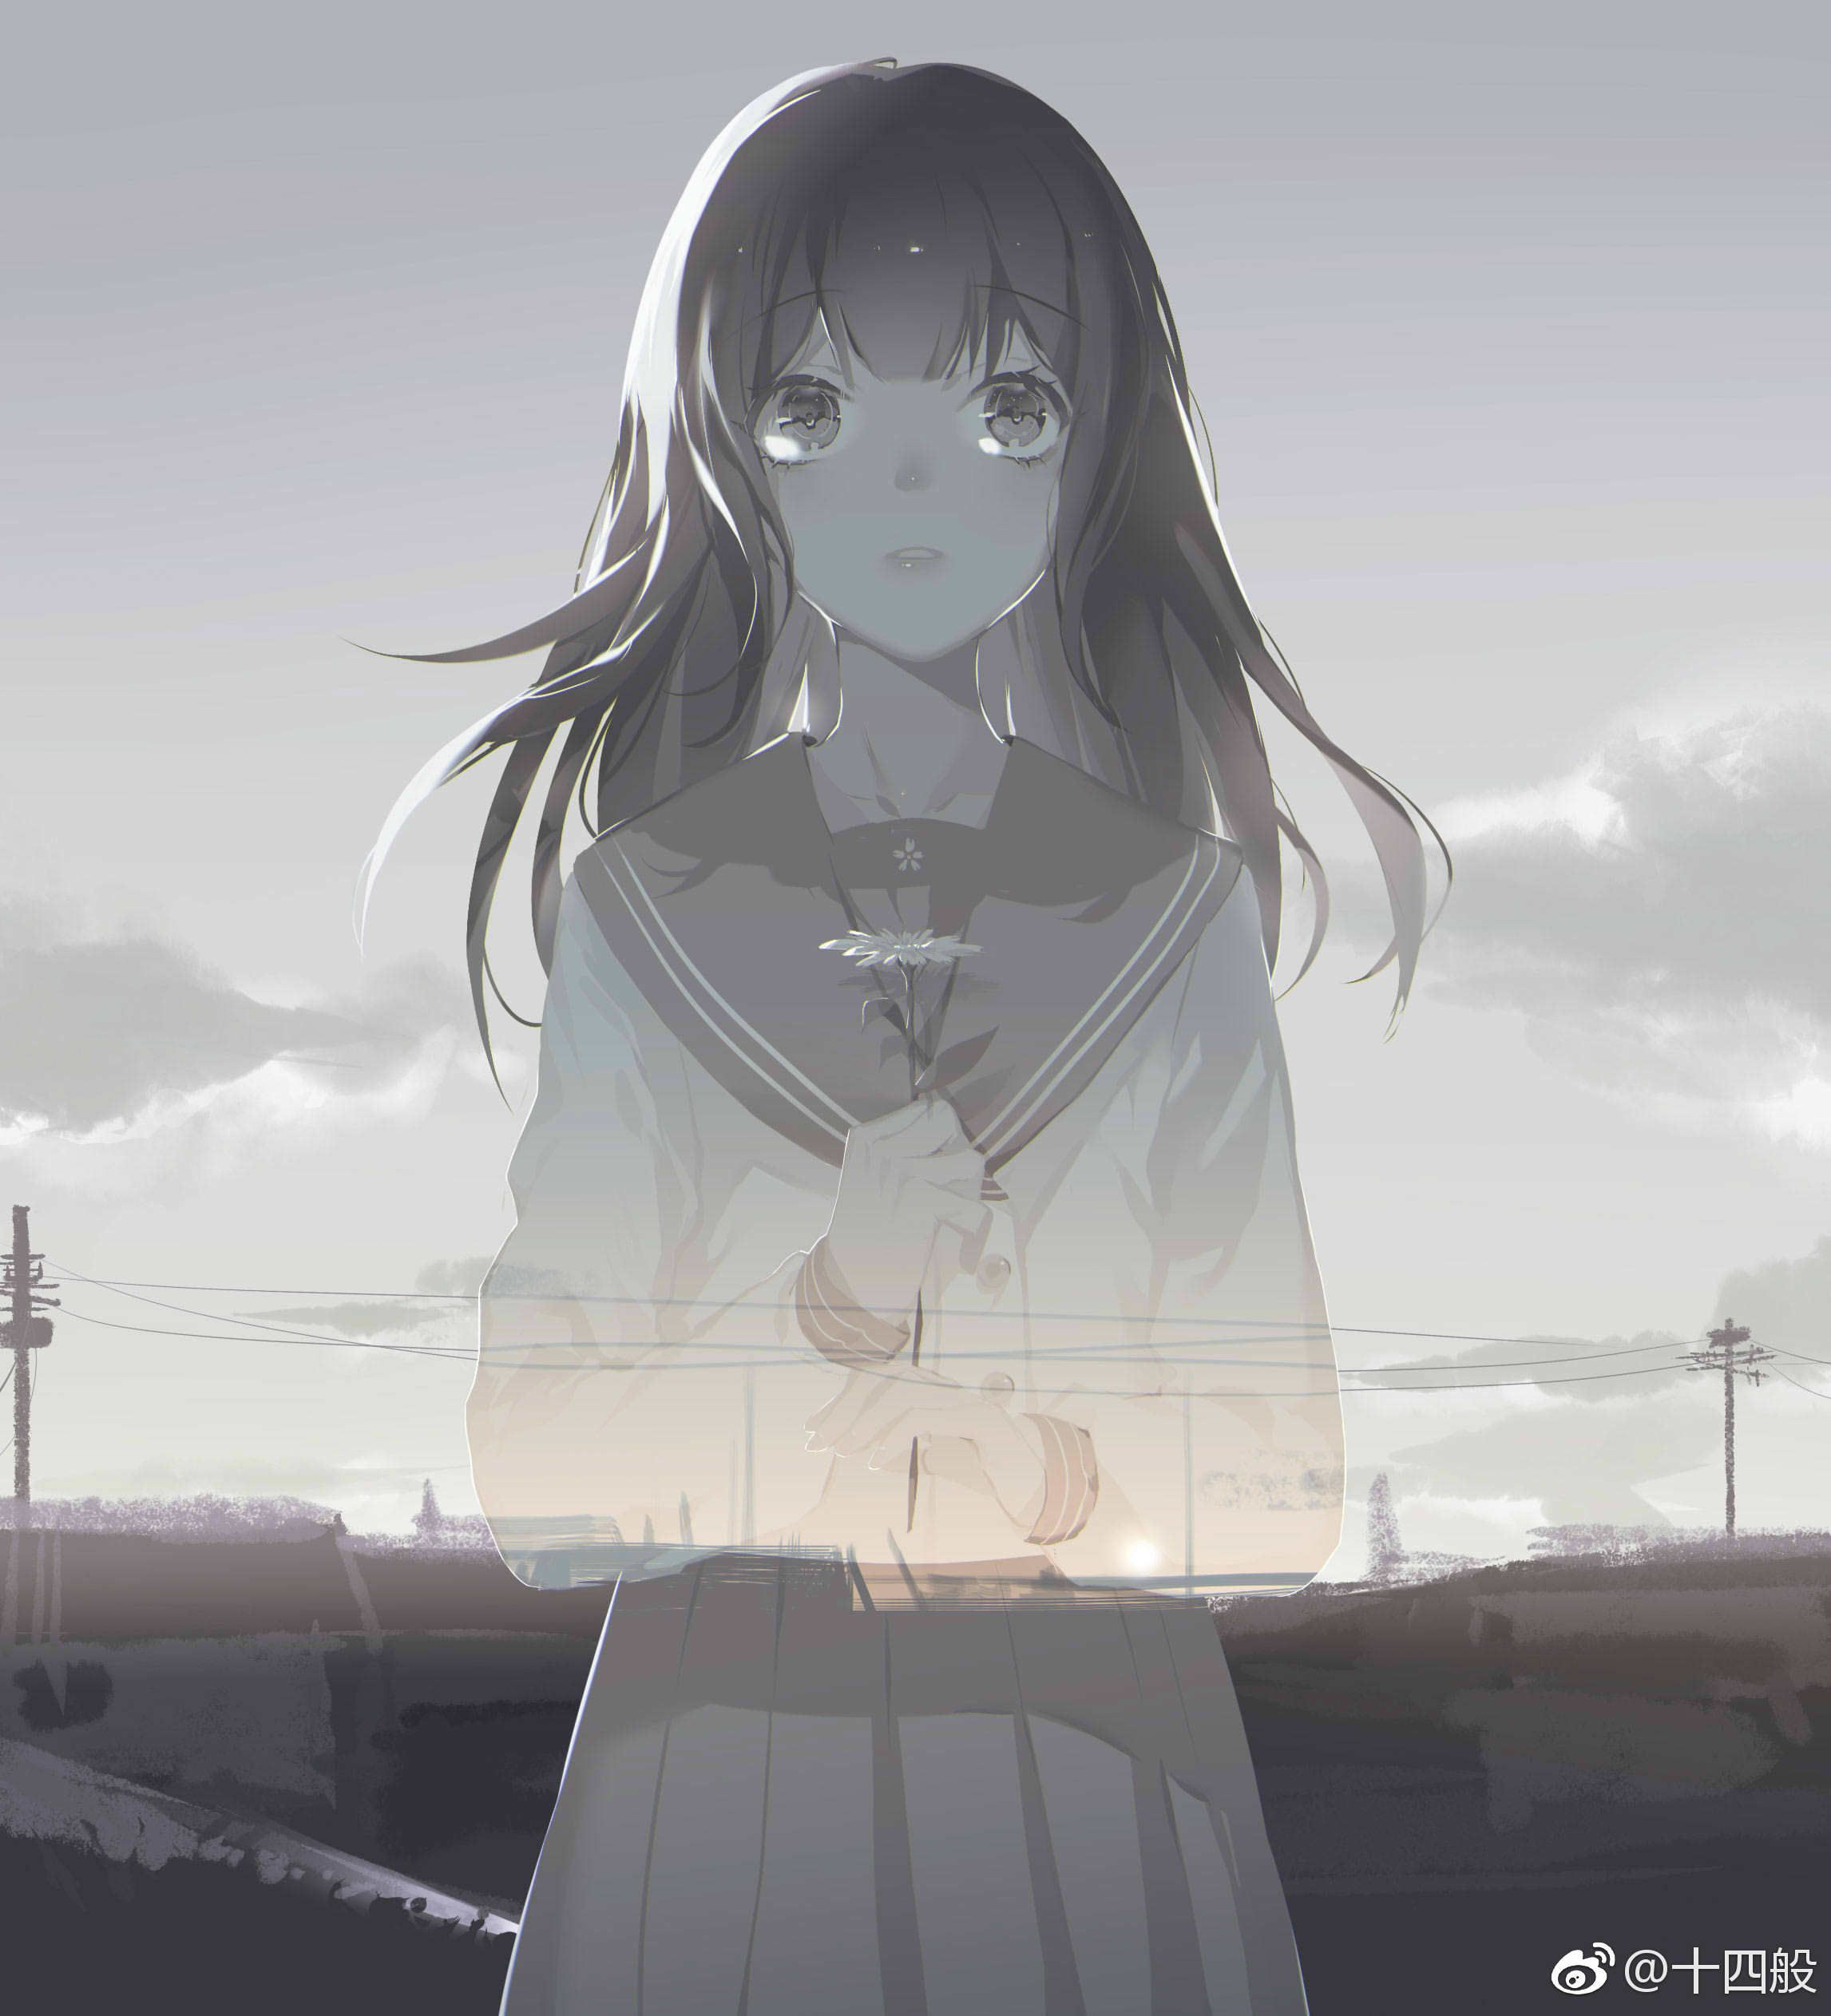 Story wa sad boy sad girls trending. Pp Anime Galau Picture Idokeren